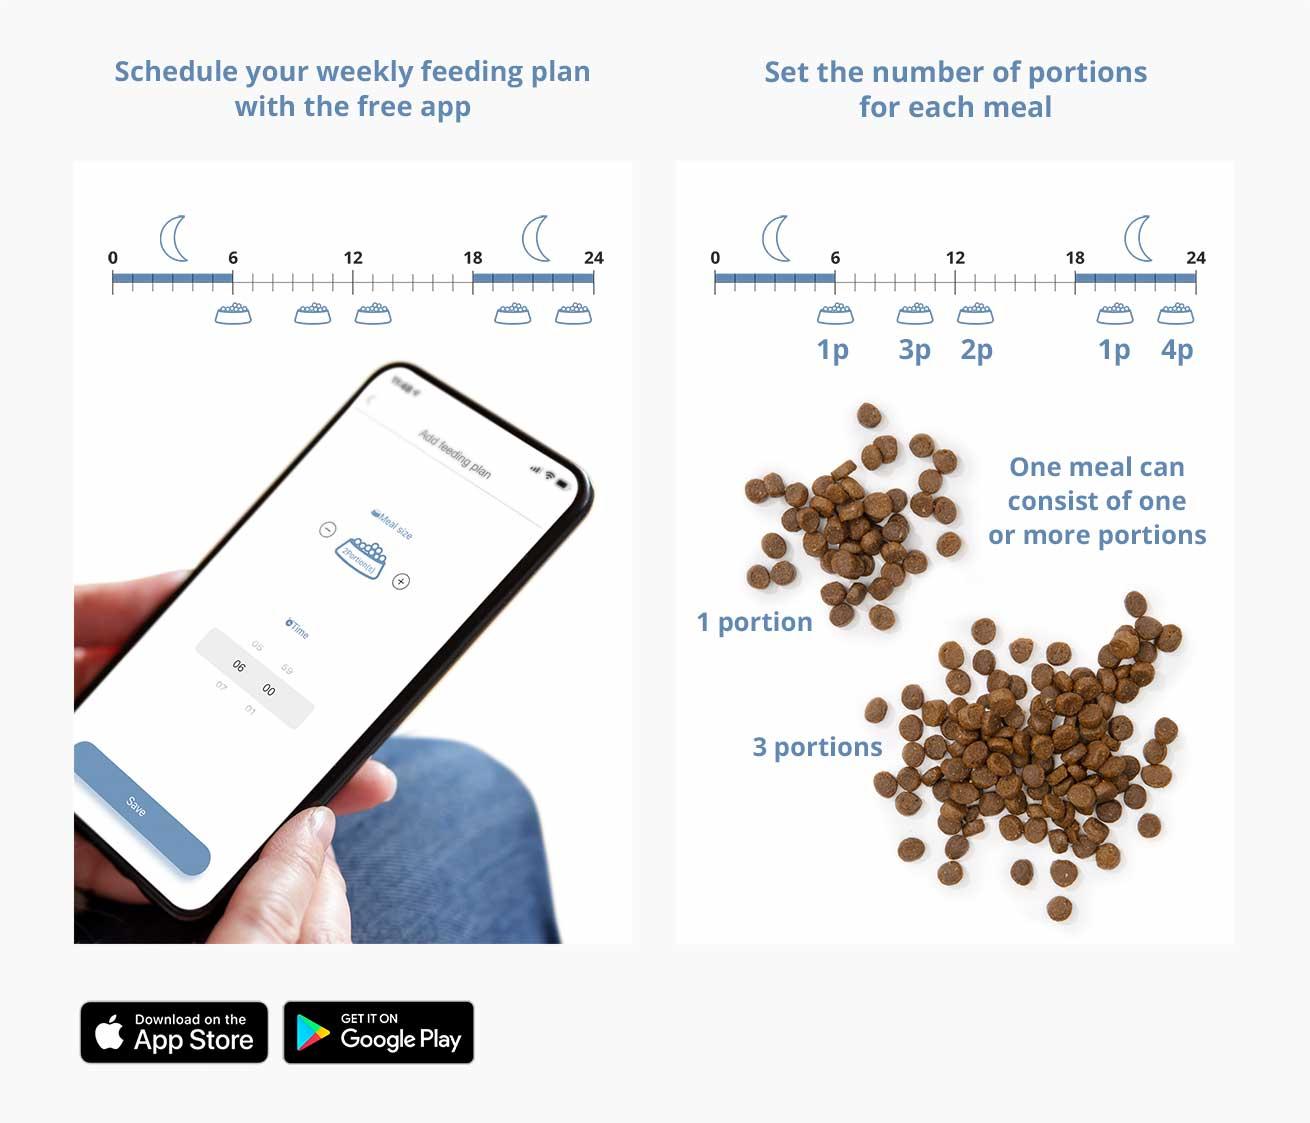 Set up a weekly feeding plan